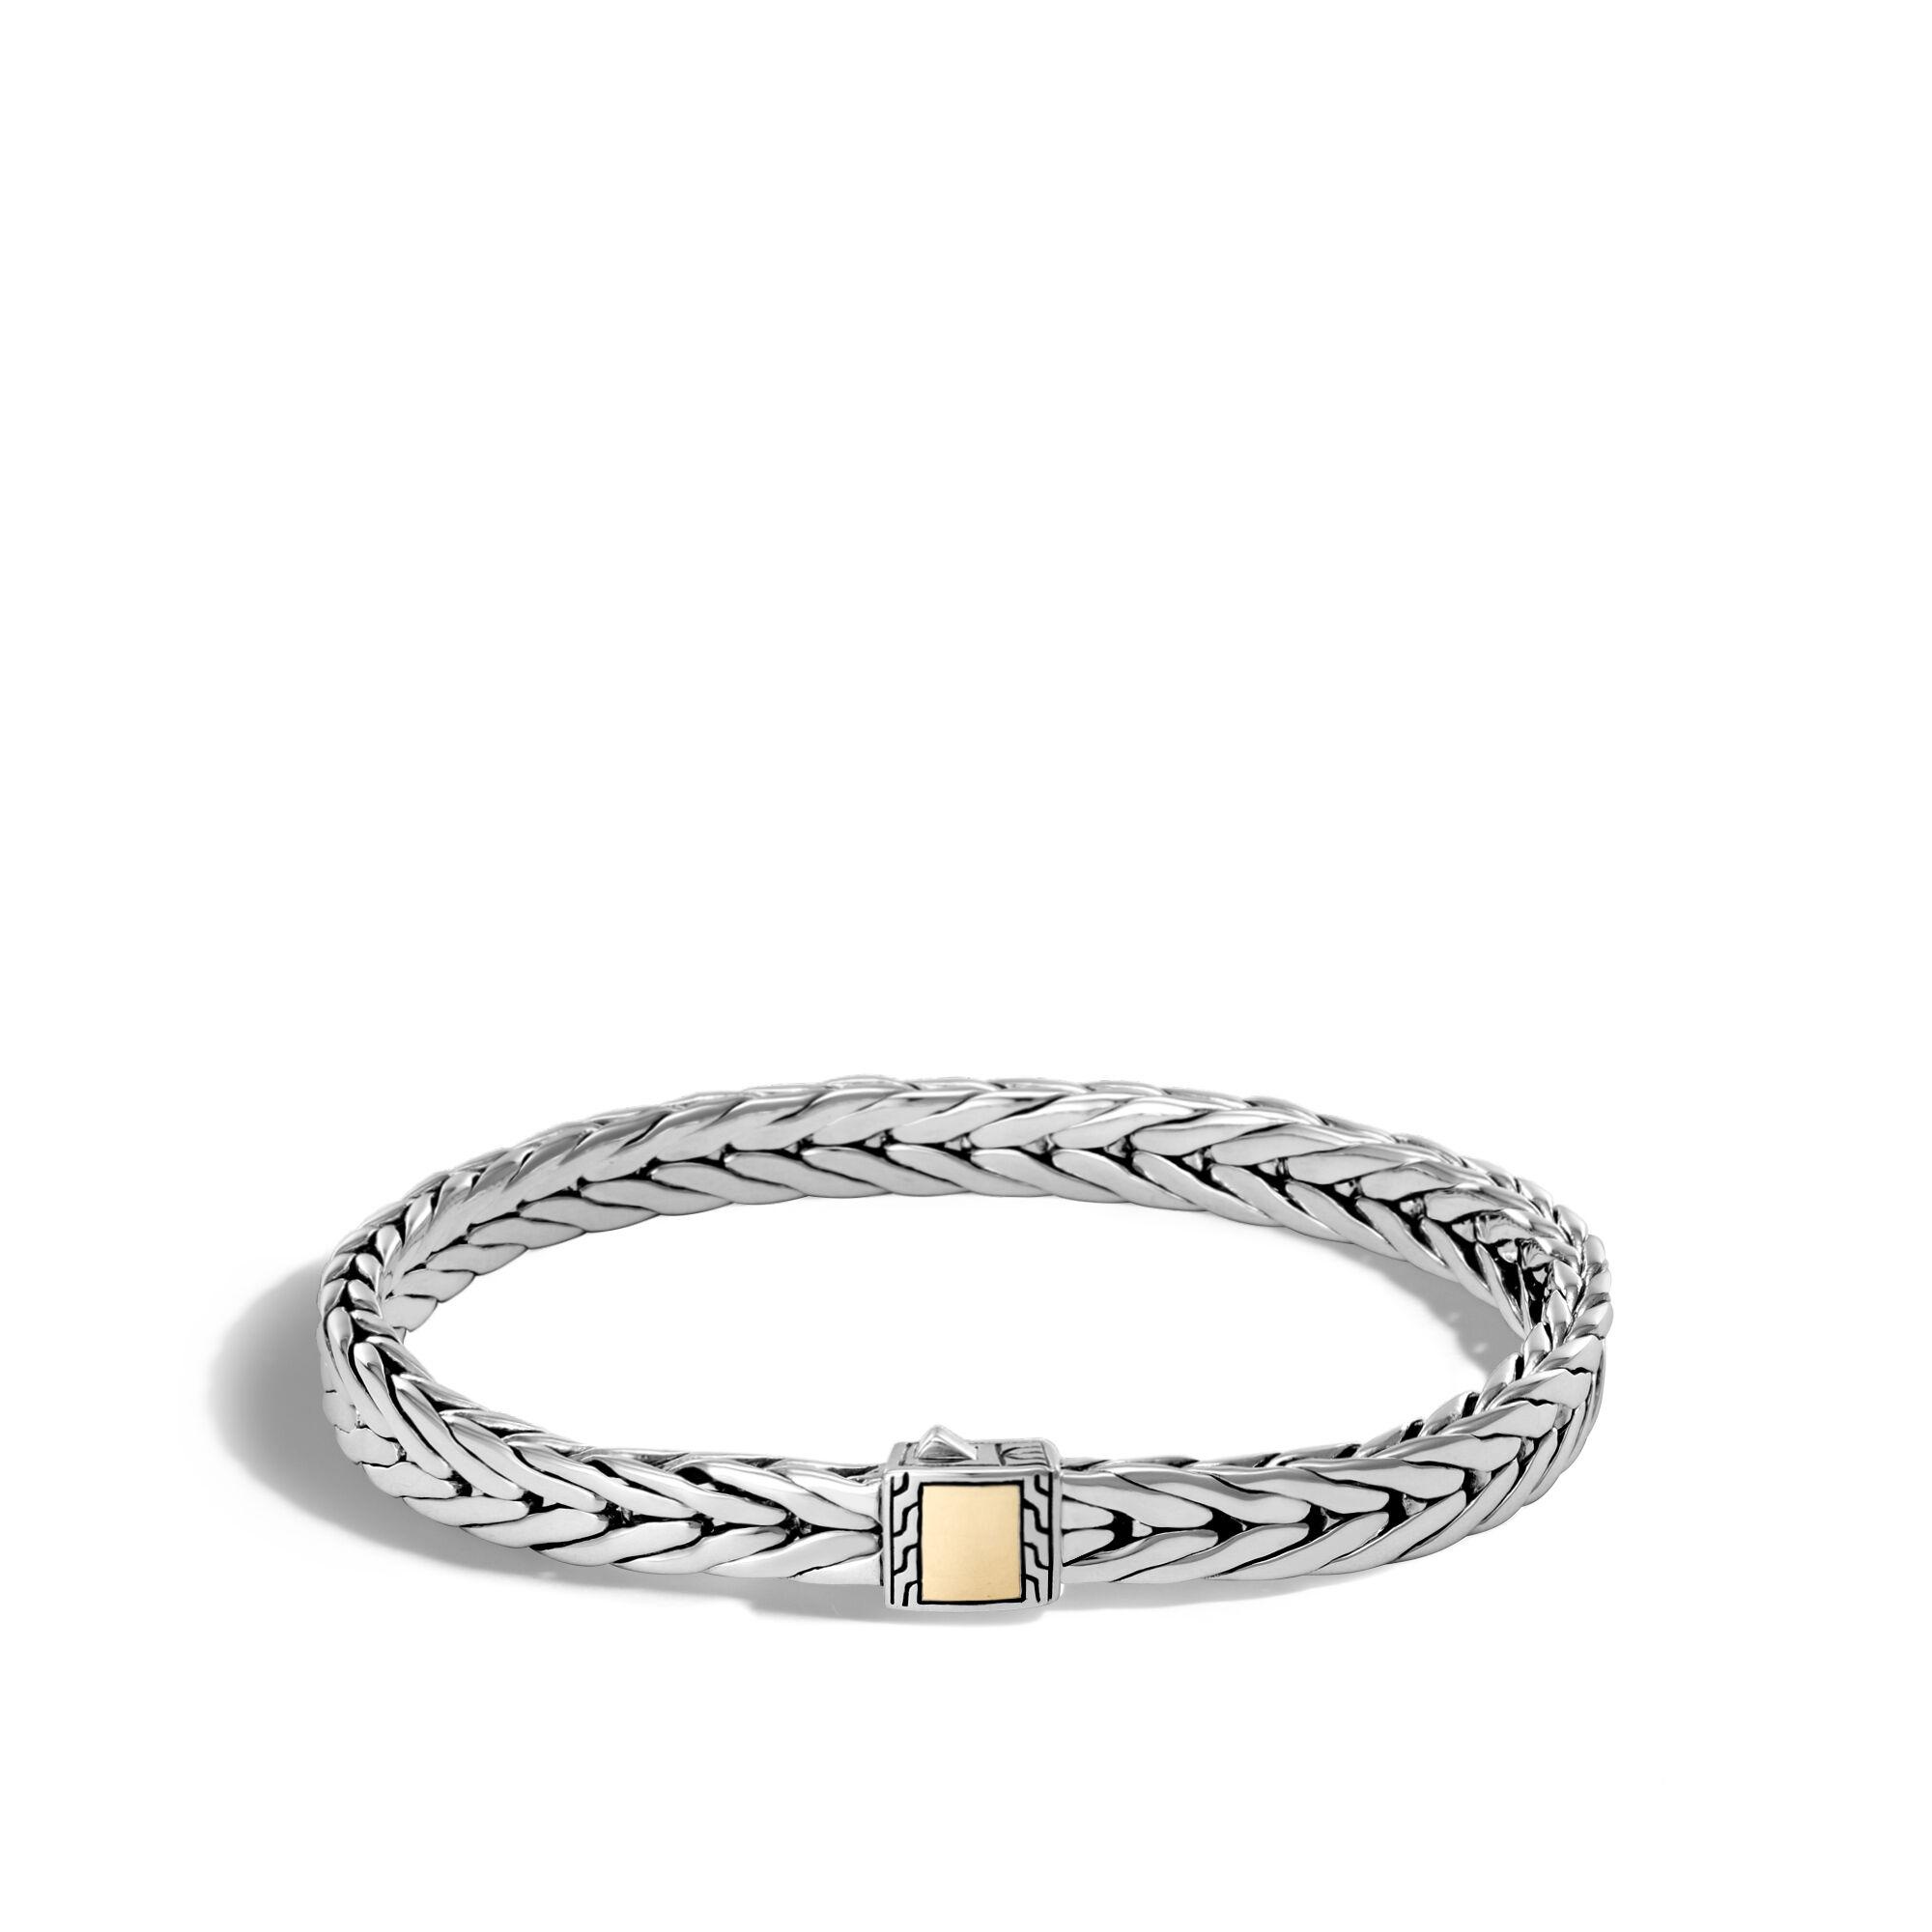 John Hardy Modern Chain Bracelet With Black Sapphire, Black Spinel Xs Black sapphire